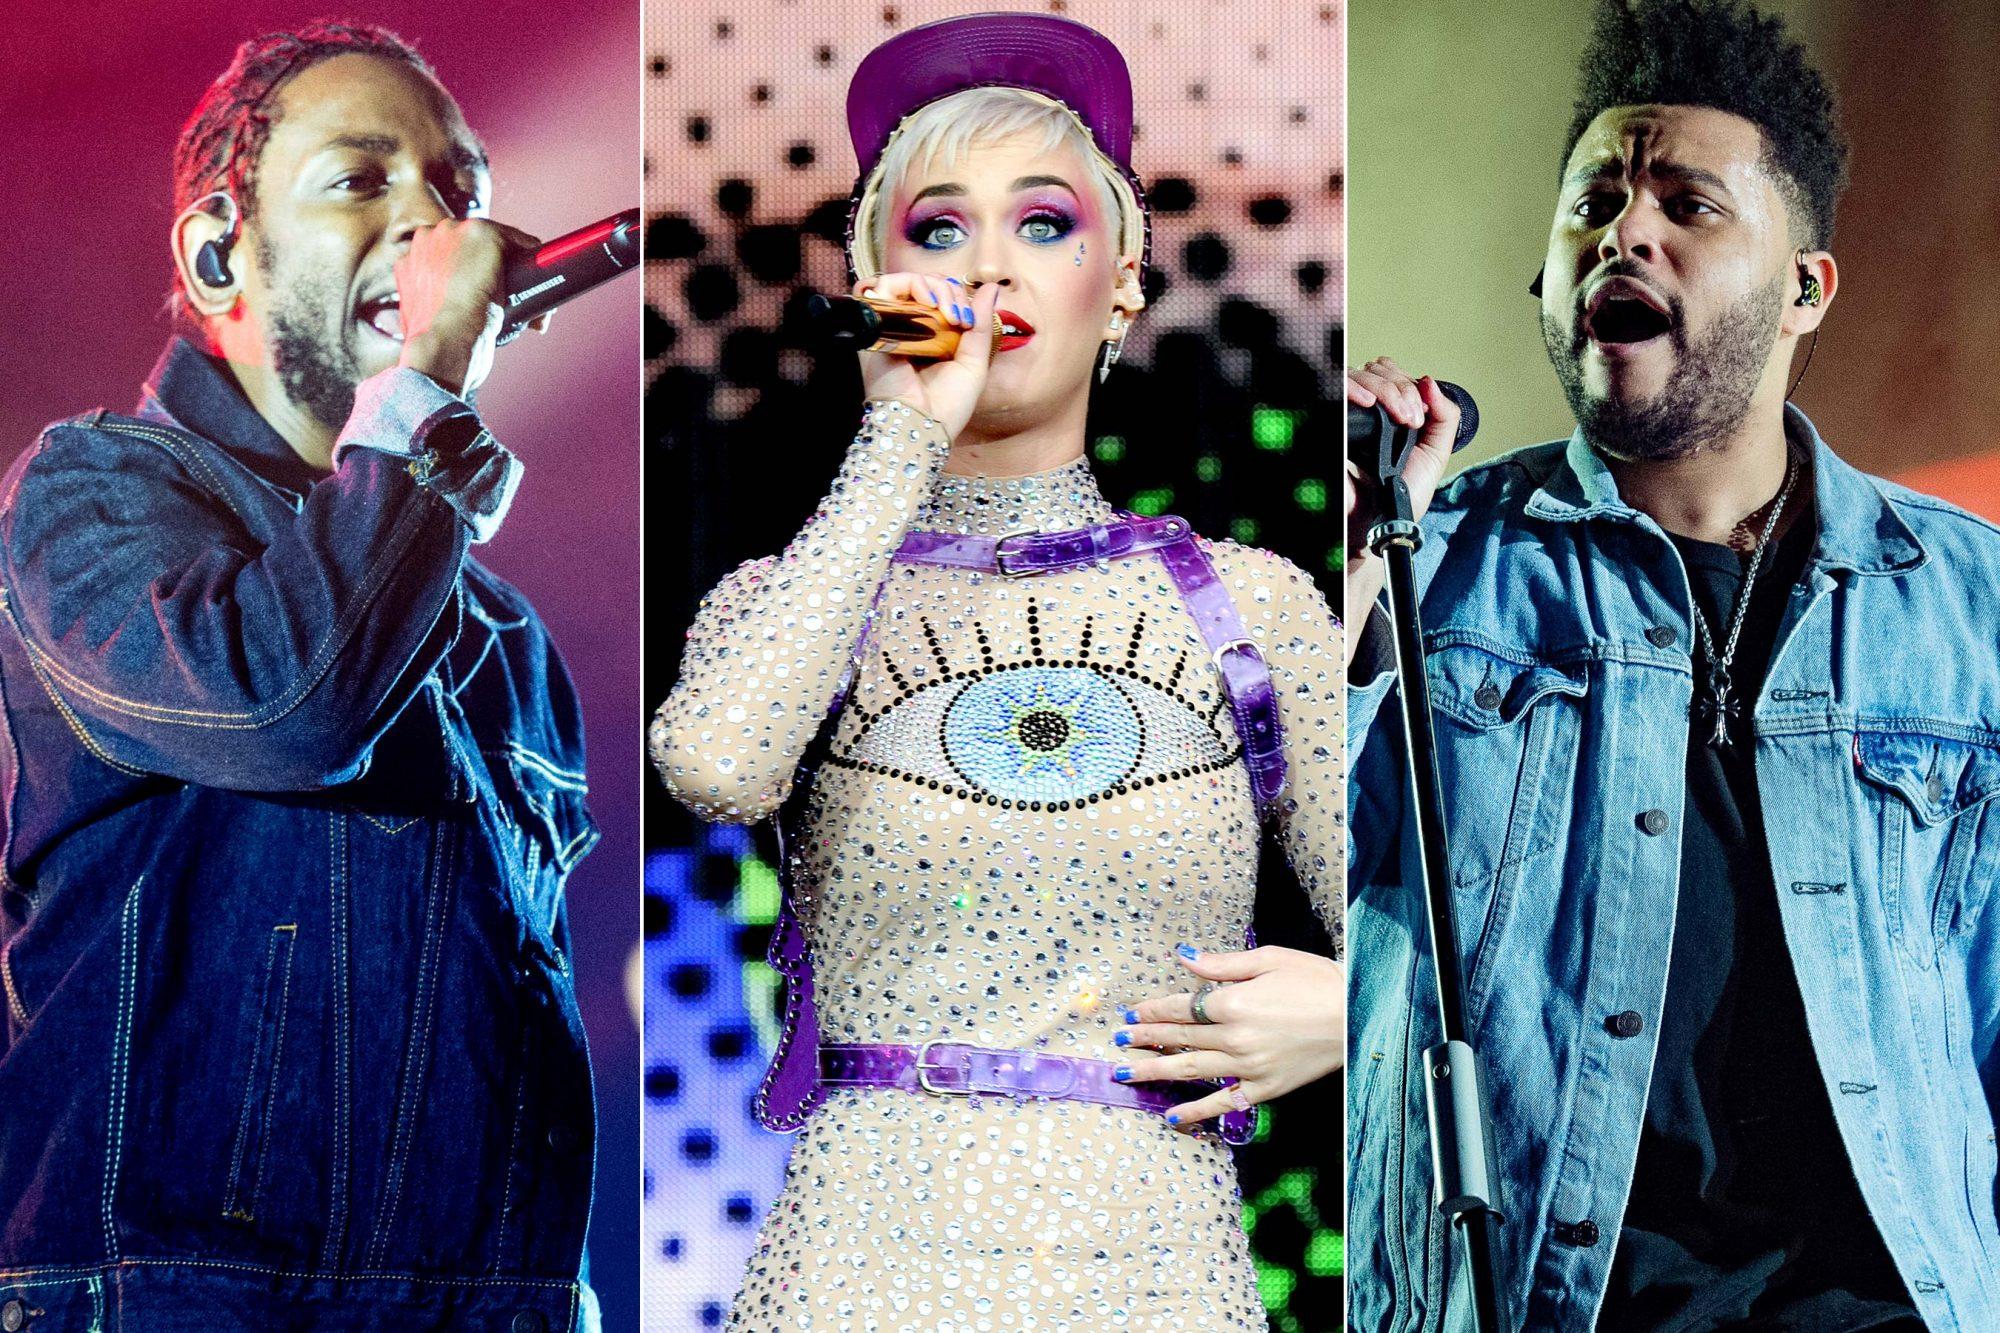 Kendrick Lamar / Katy Perry / The Weeknd